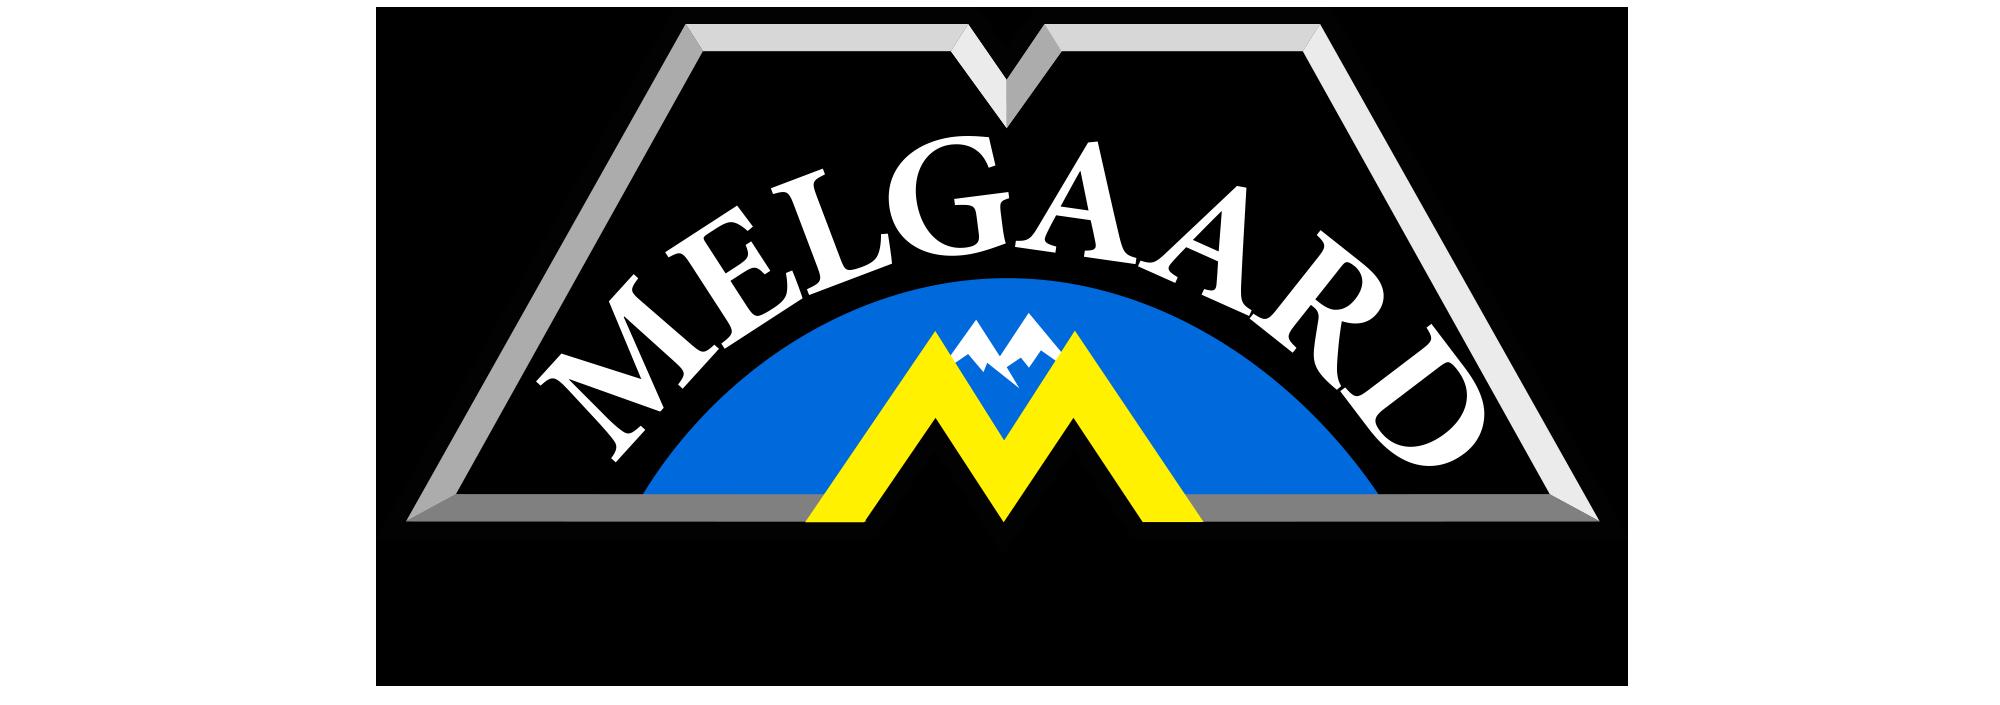 melgaard-space-logo.png